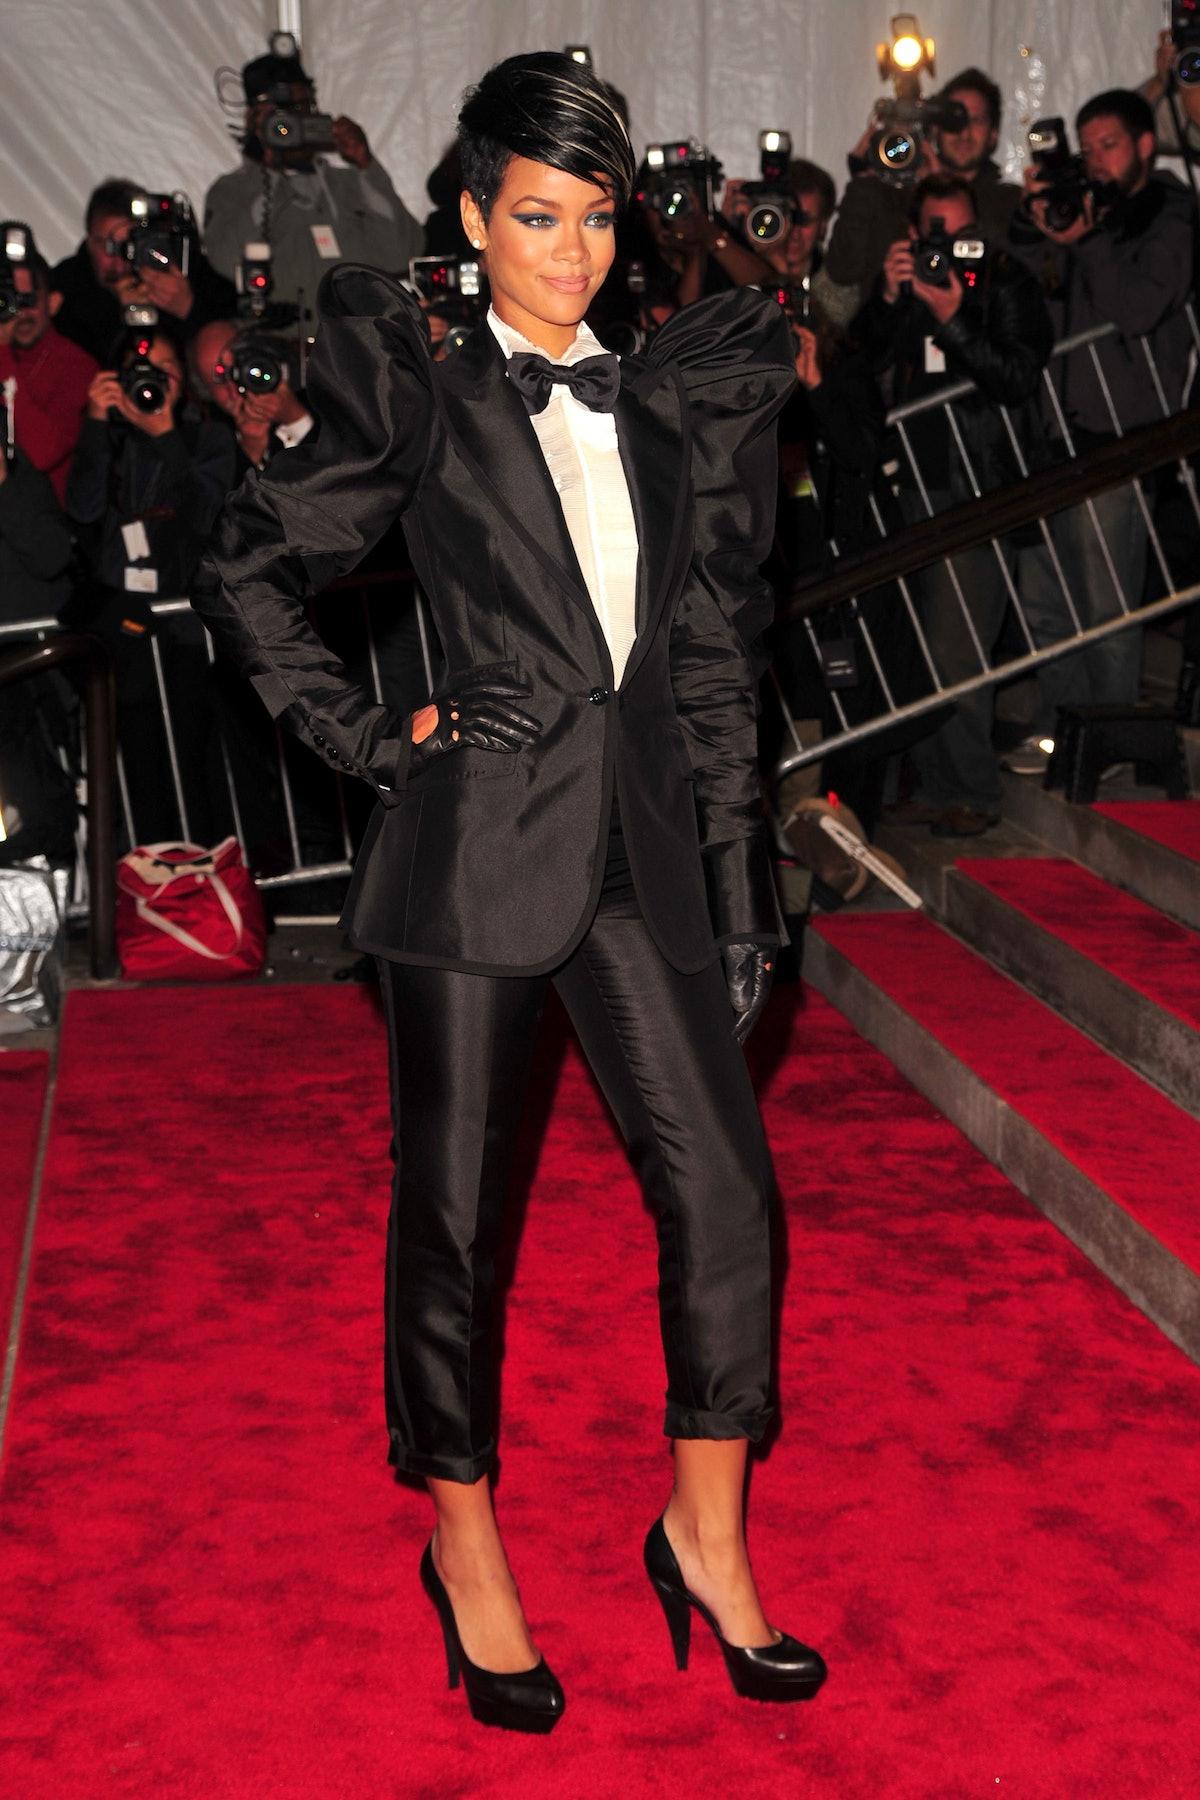 Rihanna in tuxedo.